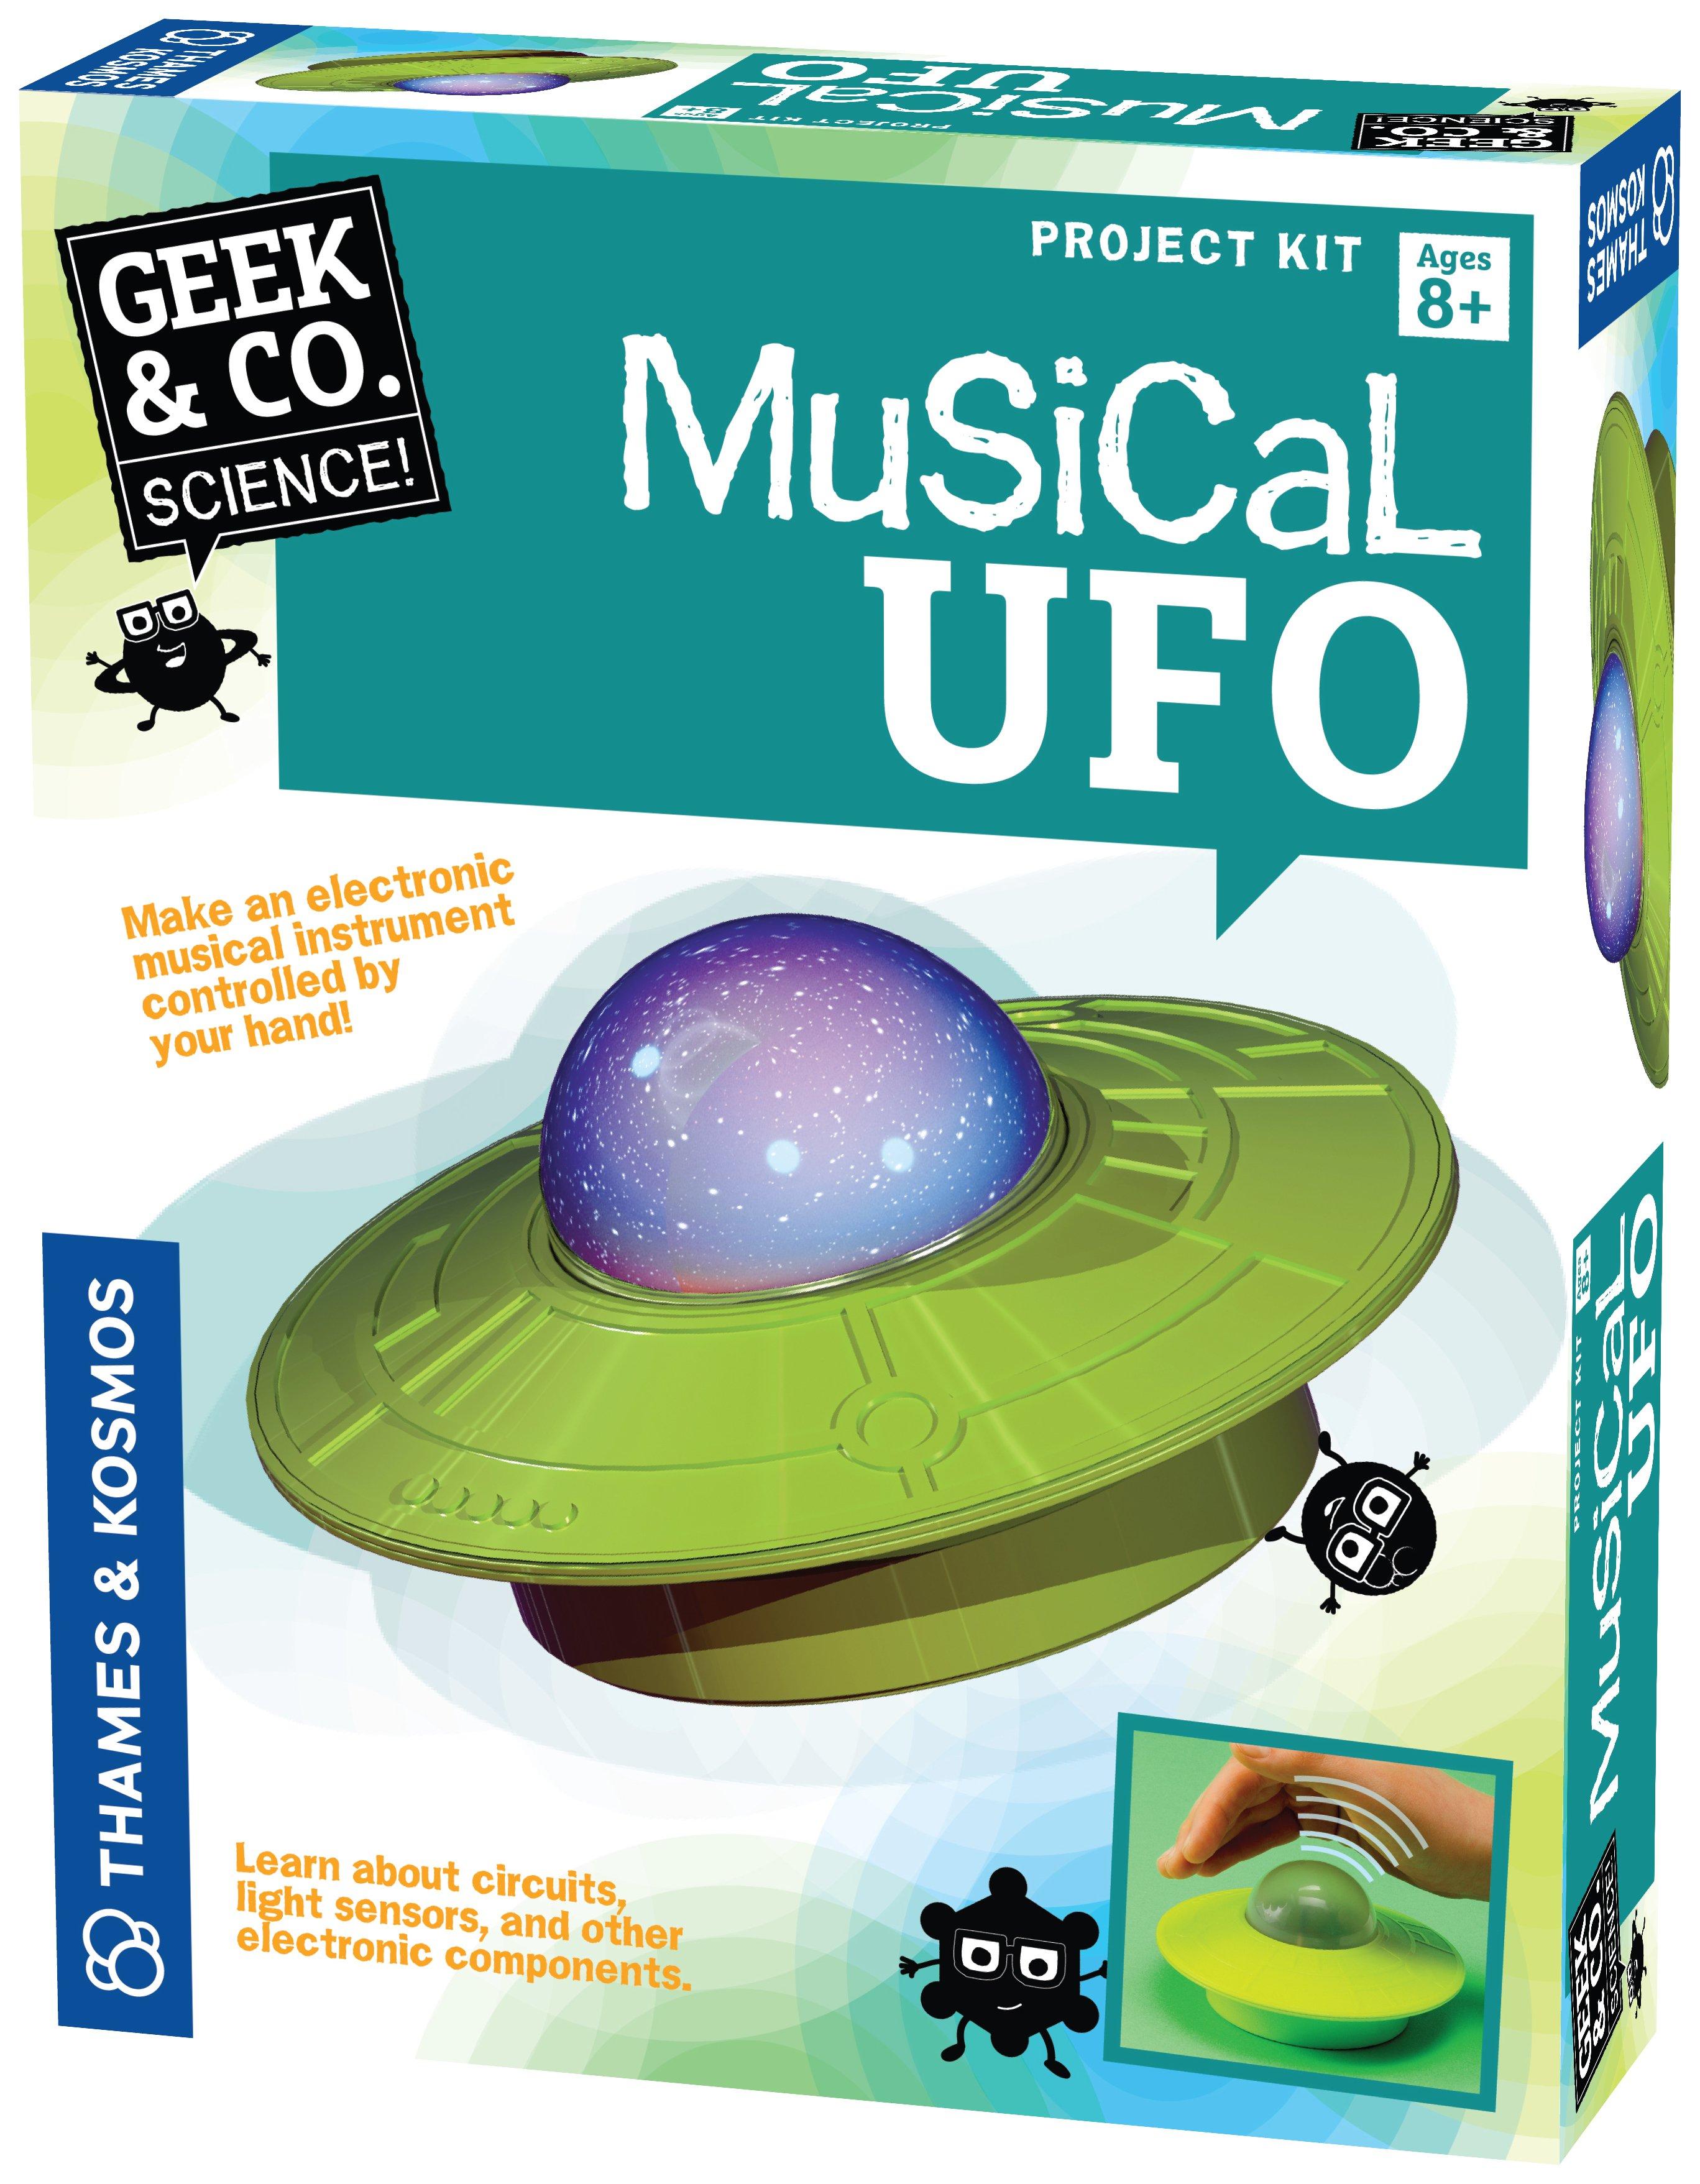 Image of Musical UFO Construction Set.